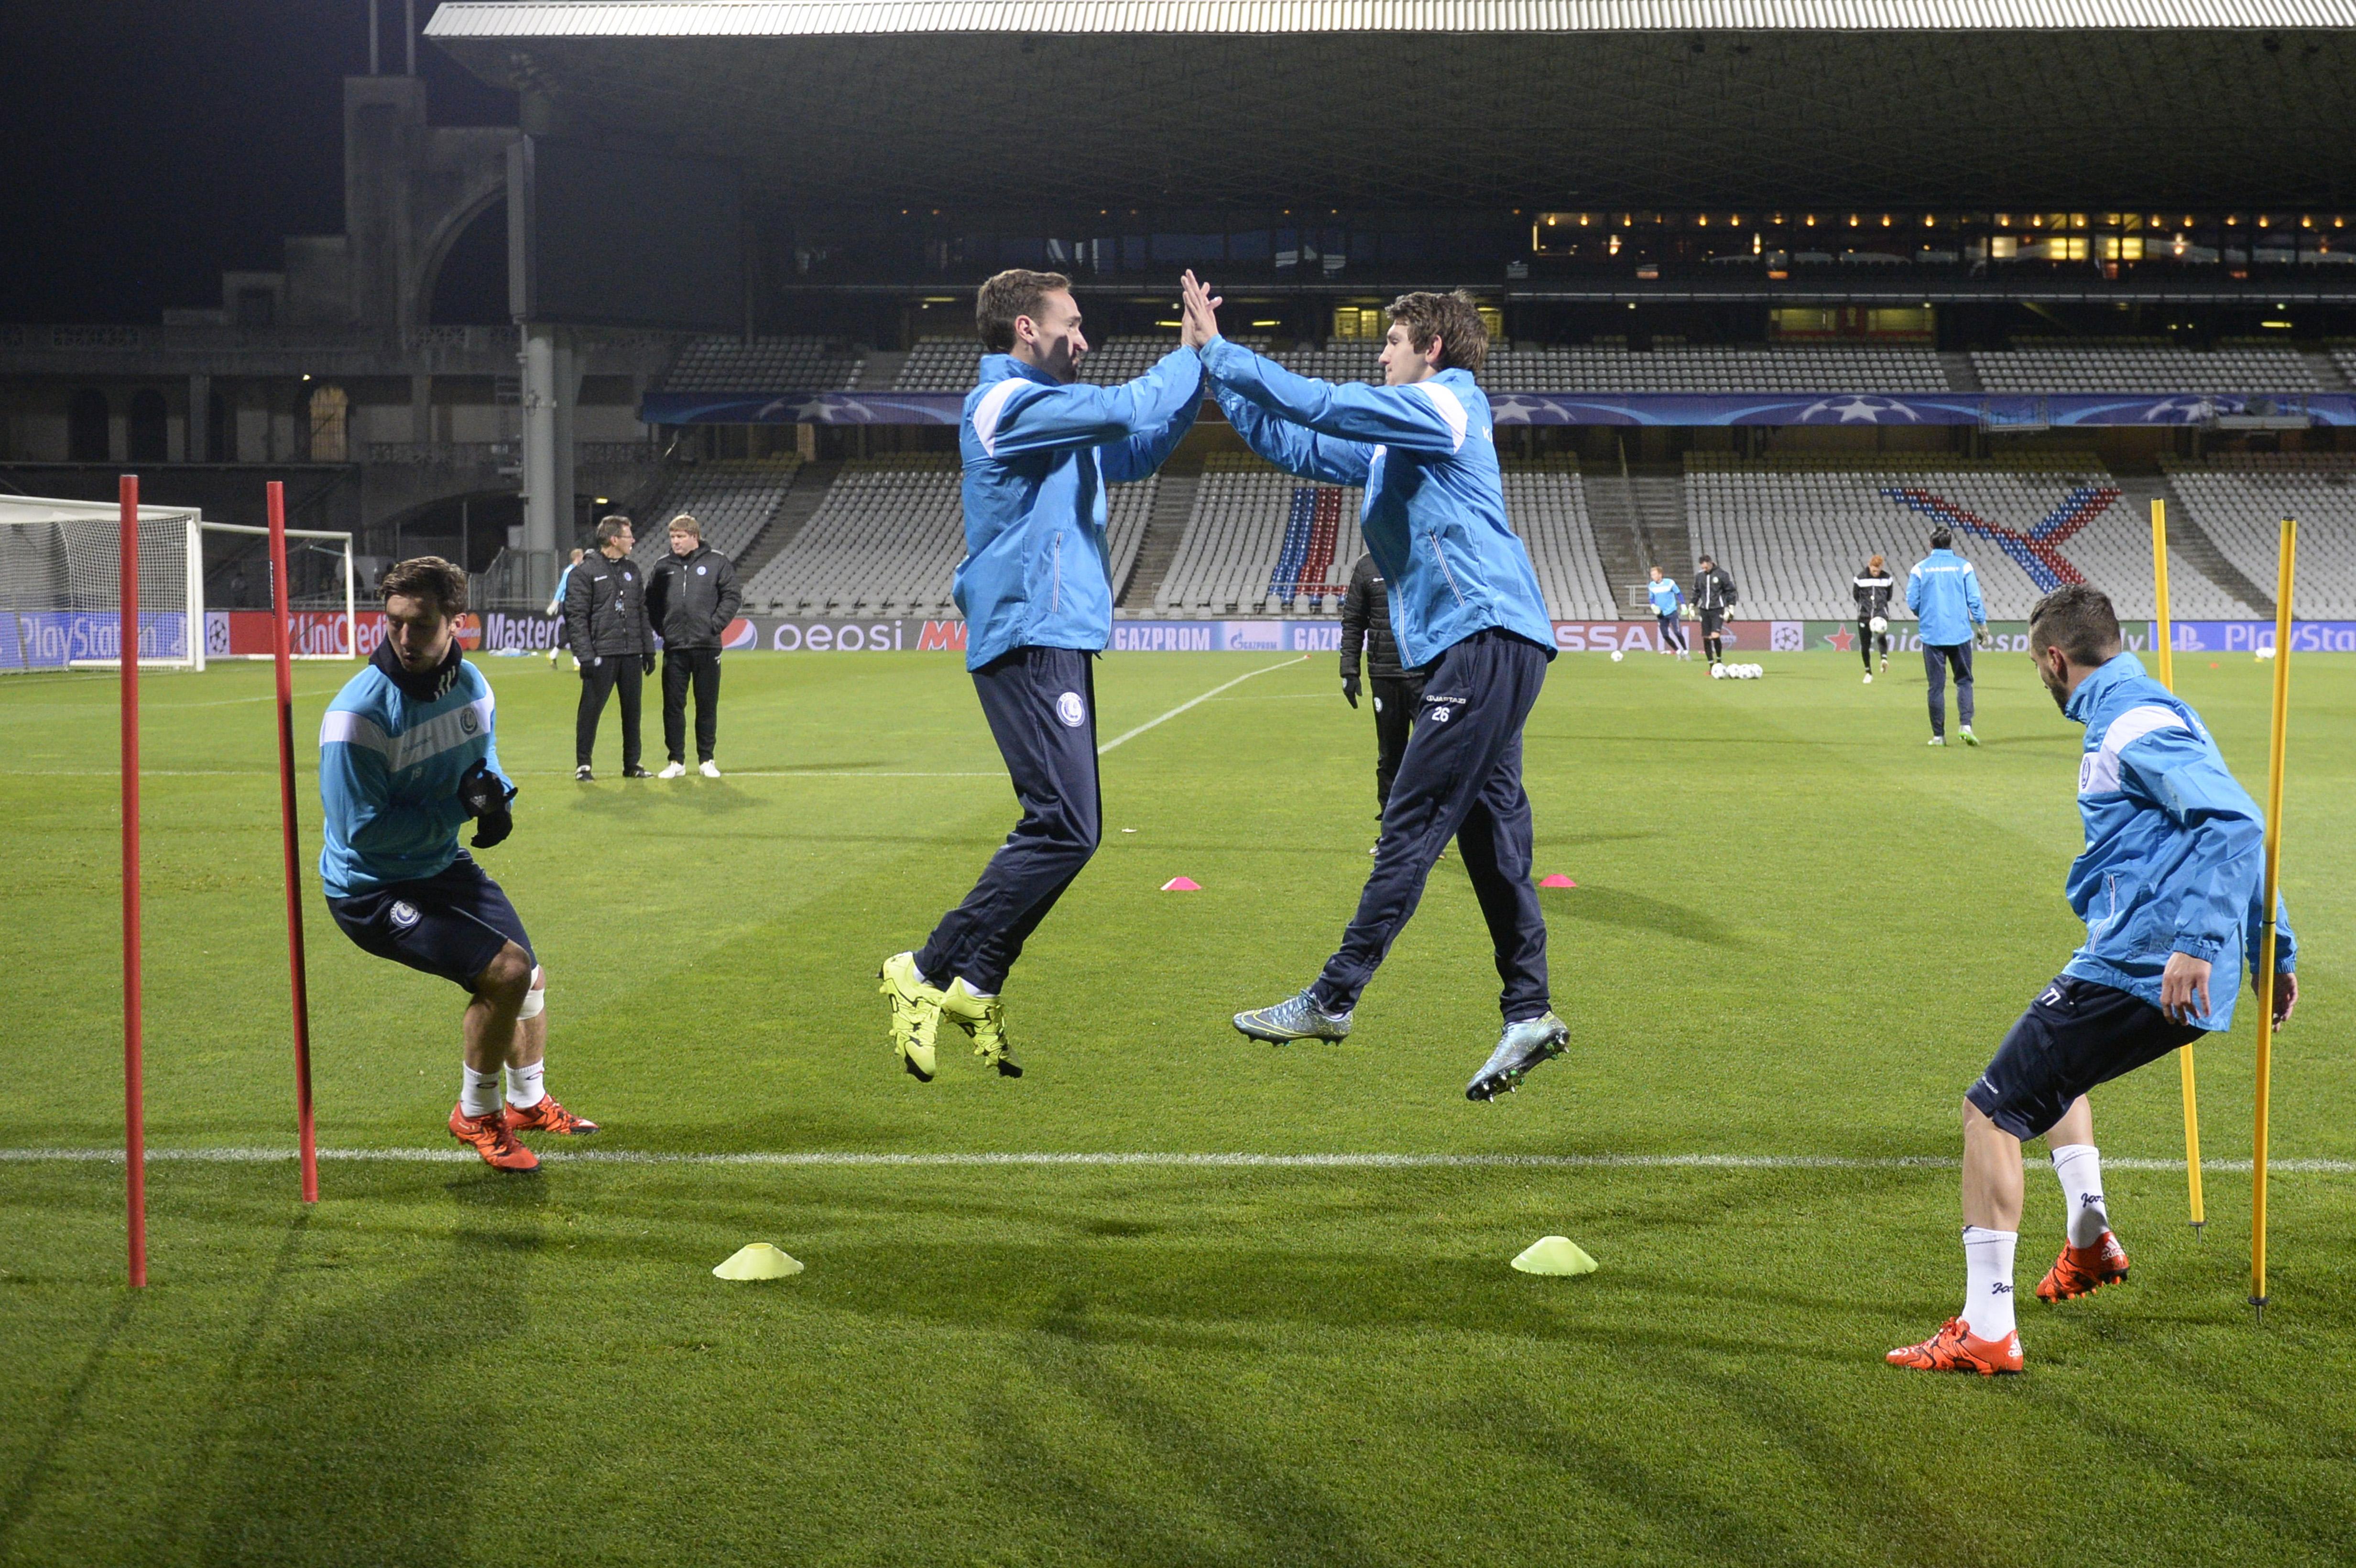 FRANCE SOCCER UEFA CHAMPIONS LEAGUE AA GENT TRAINING